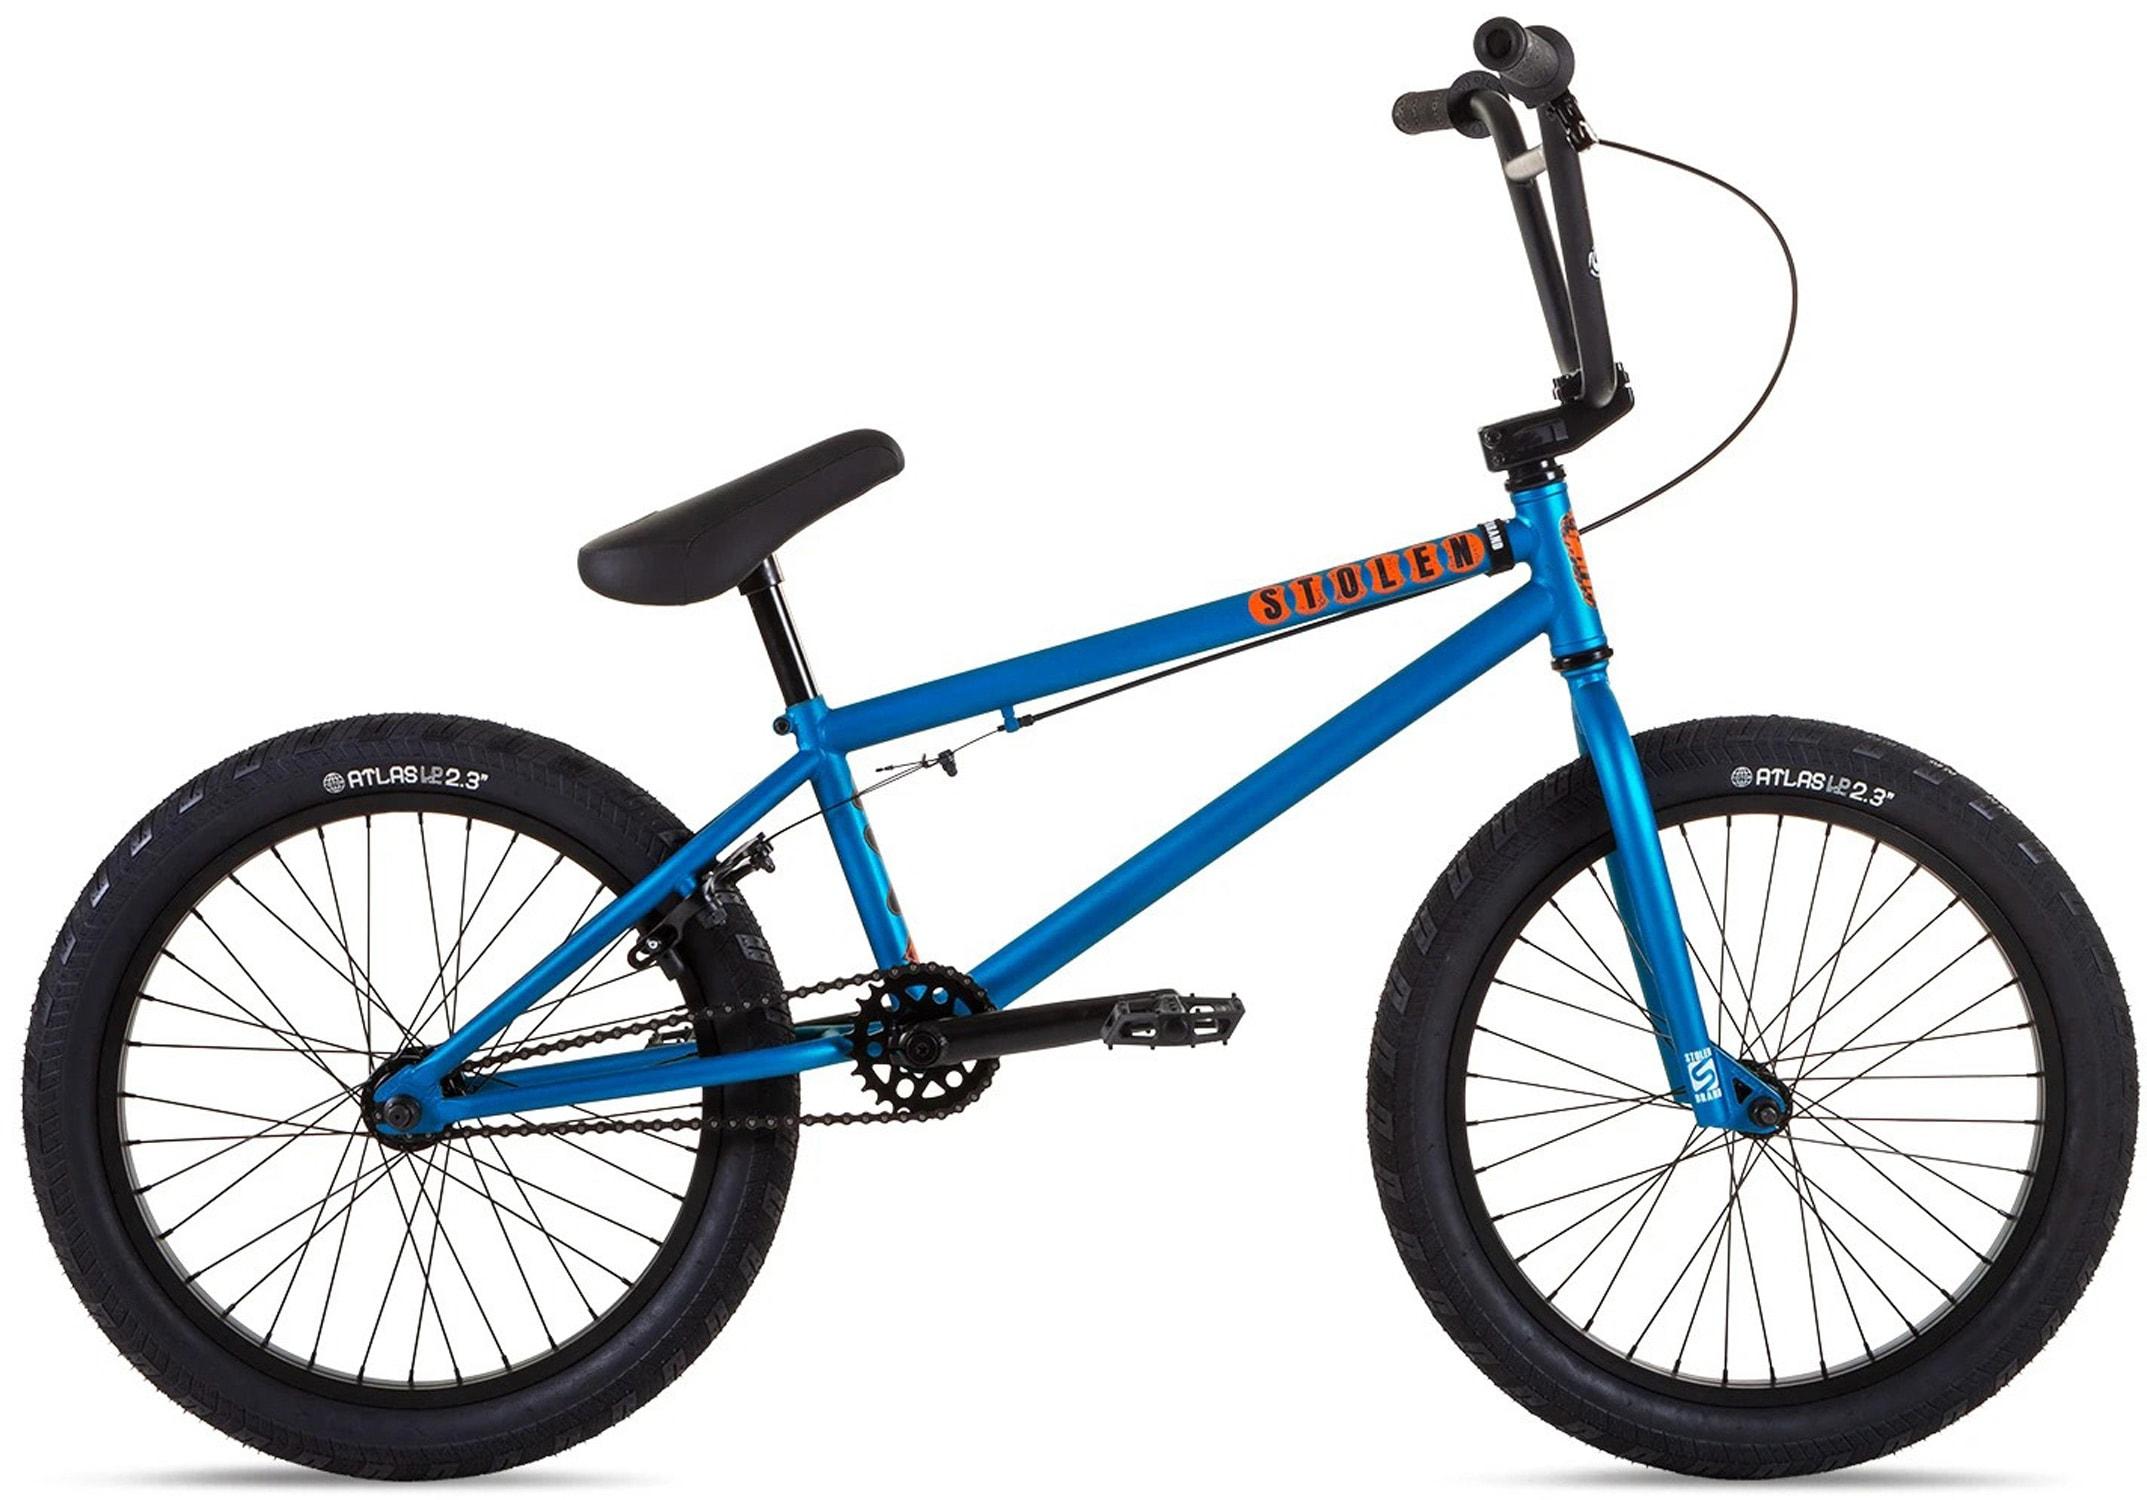 Stolen Casino BMX Bike